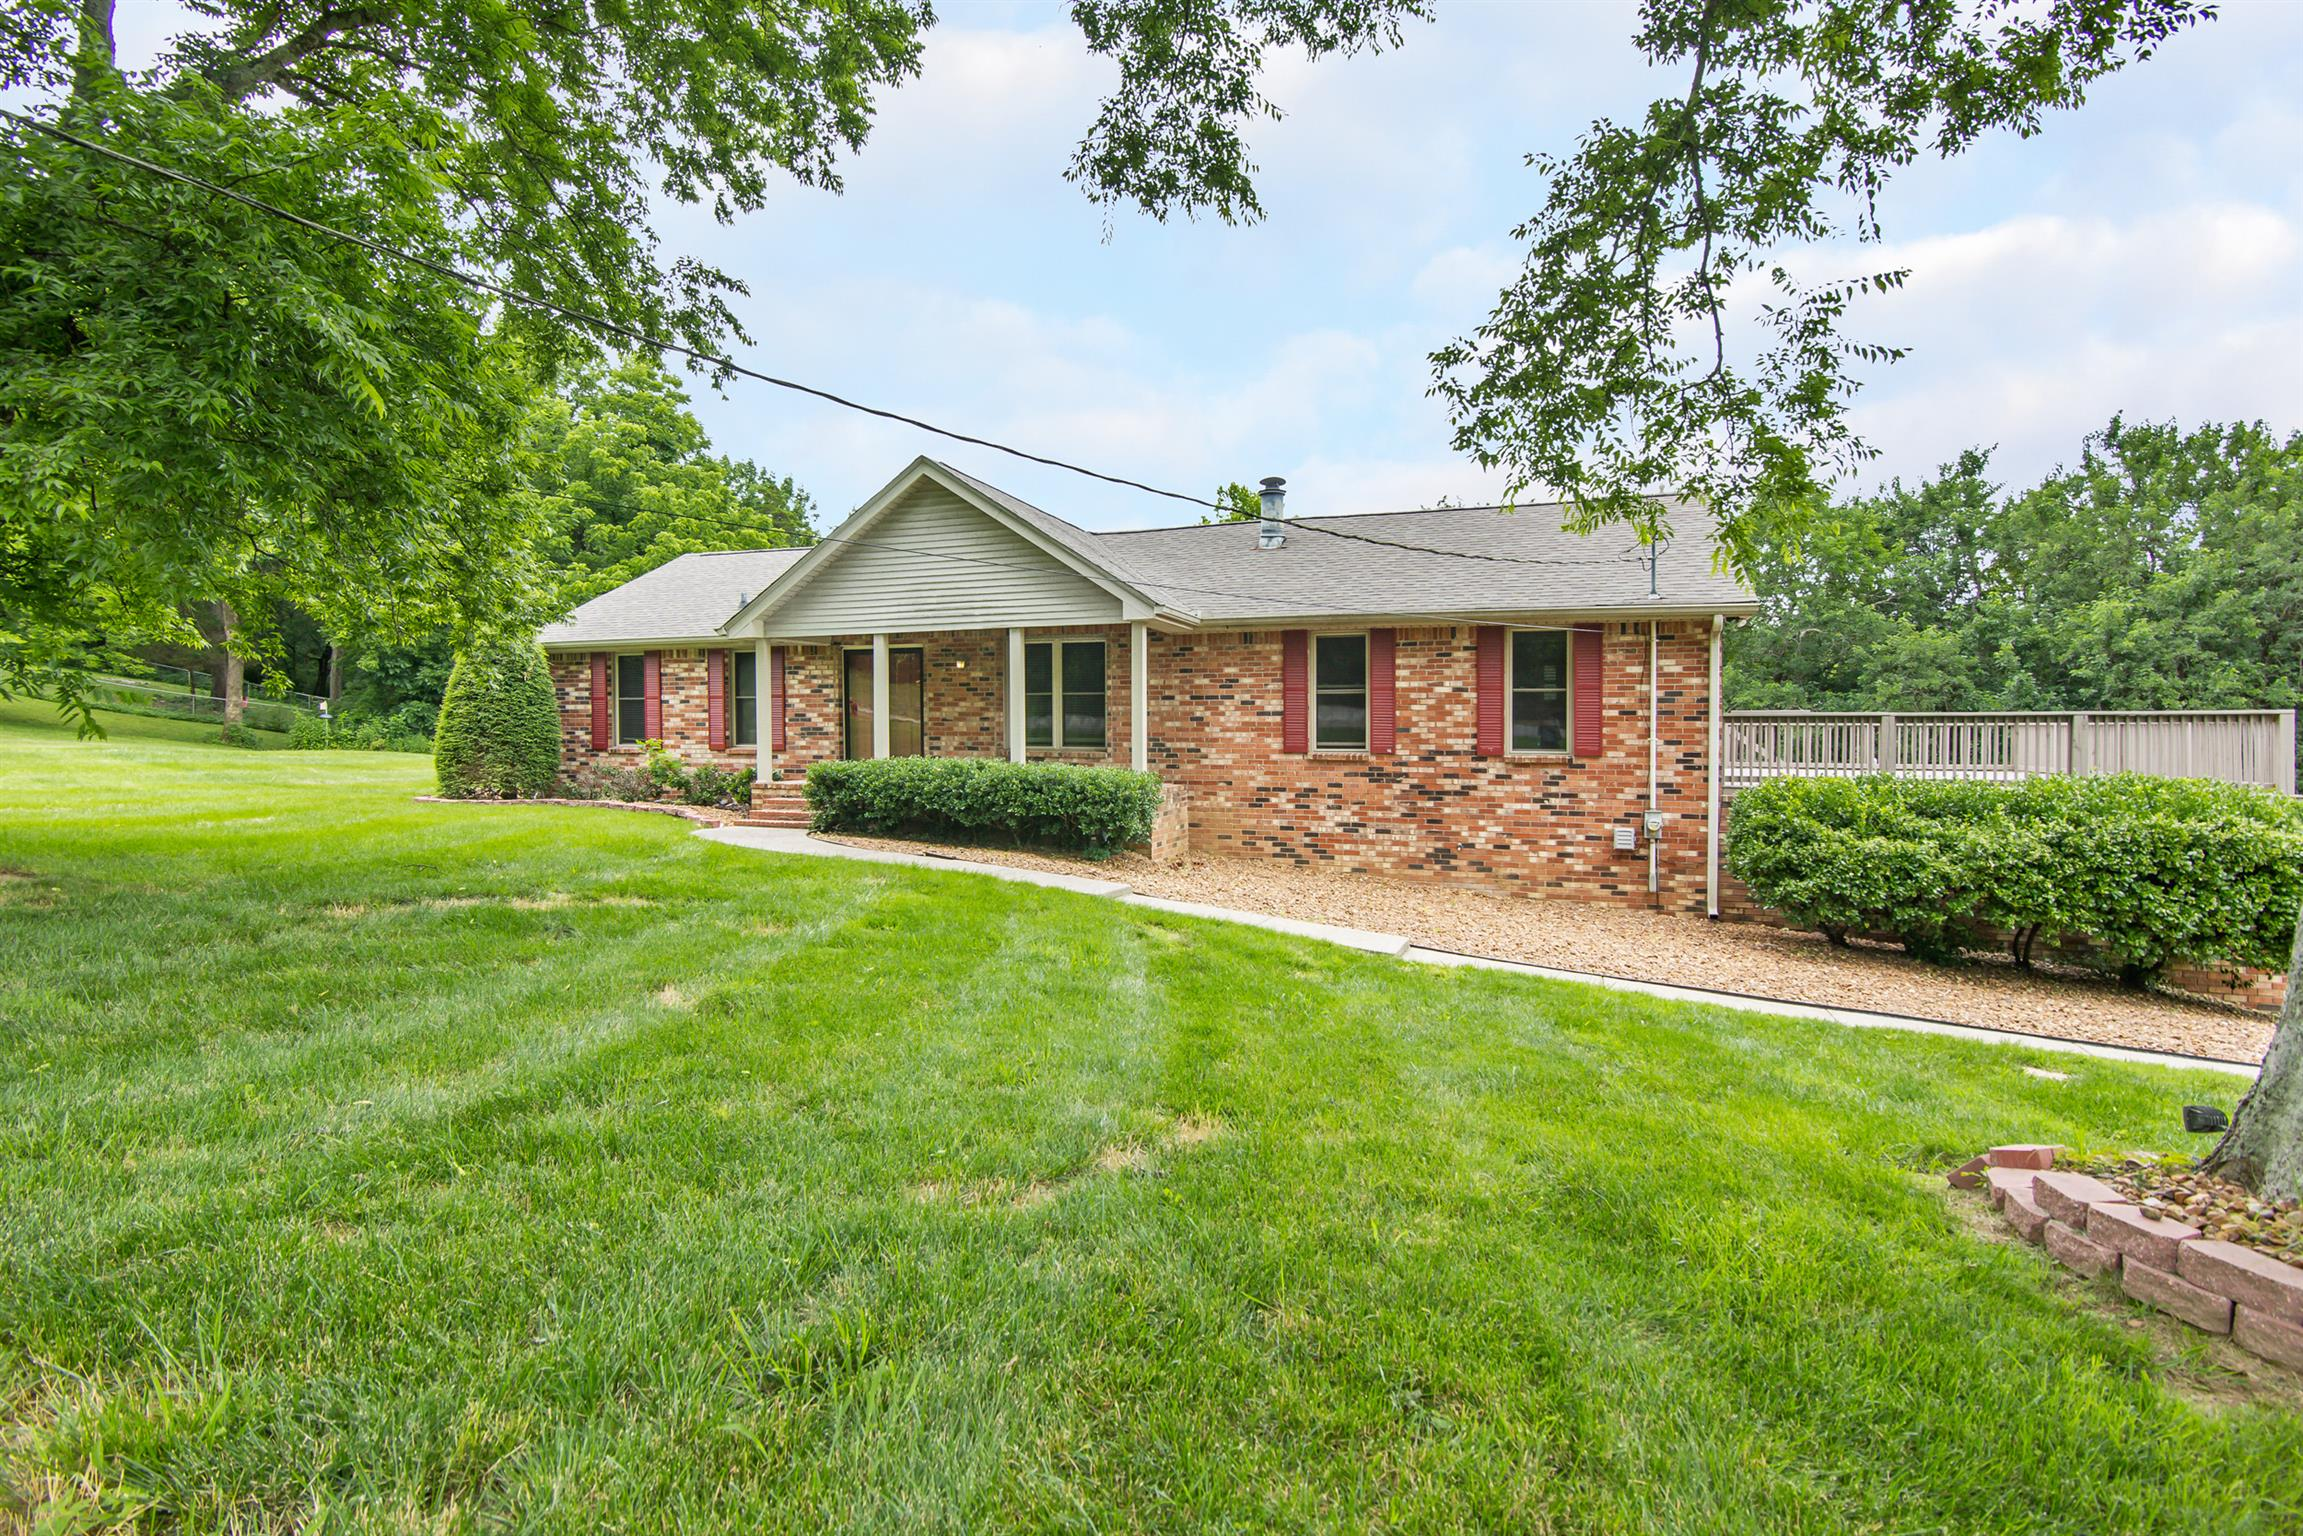 411 Northwind Ct, Goodlettsville, TN 37072 - Goodlettsville, TN real estate listing